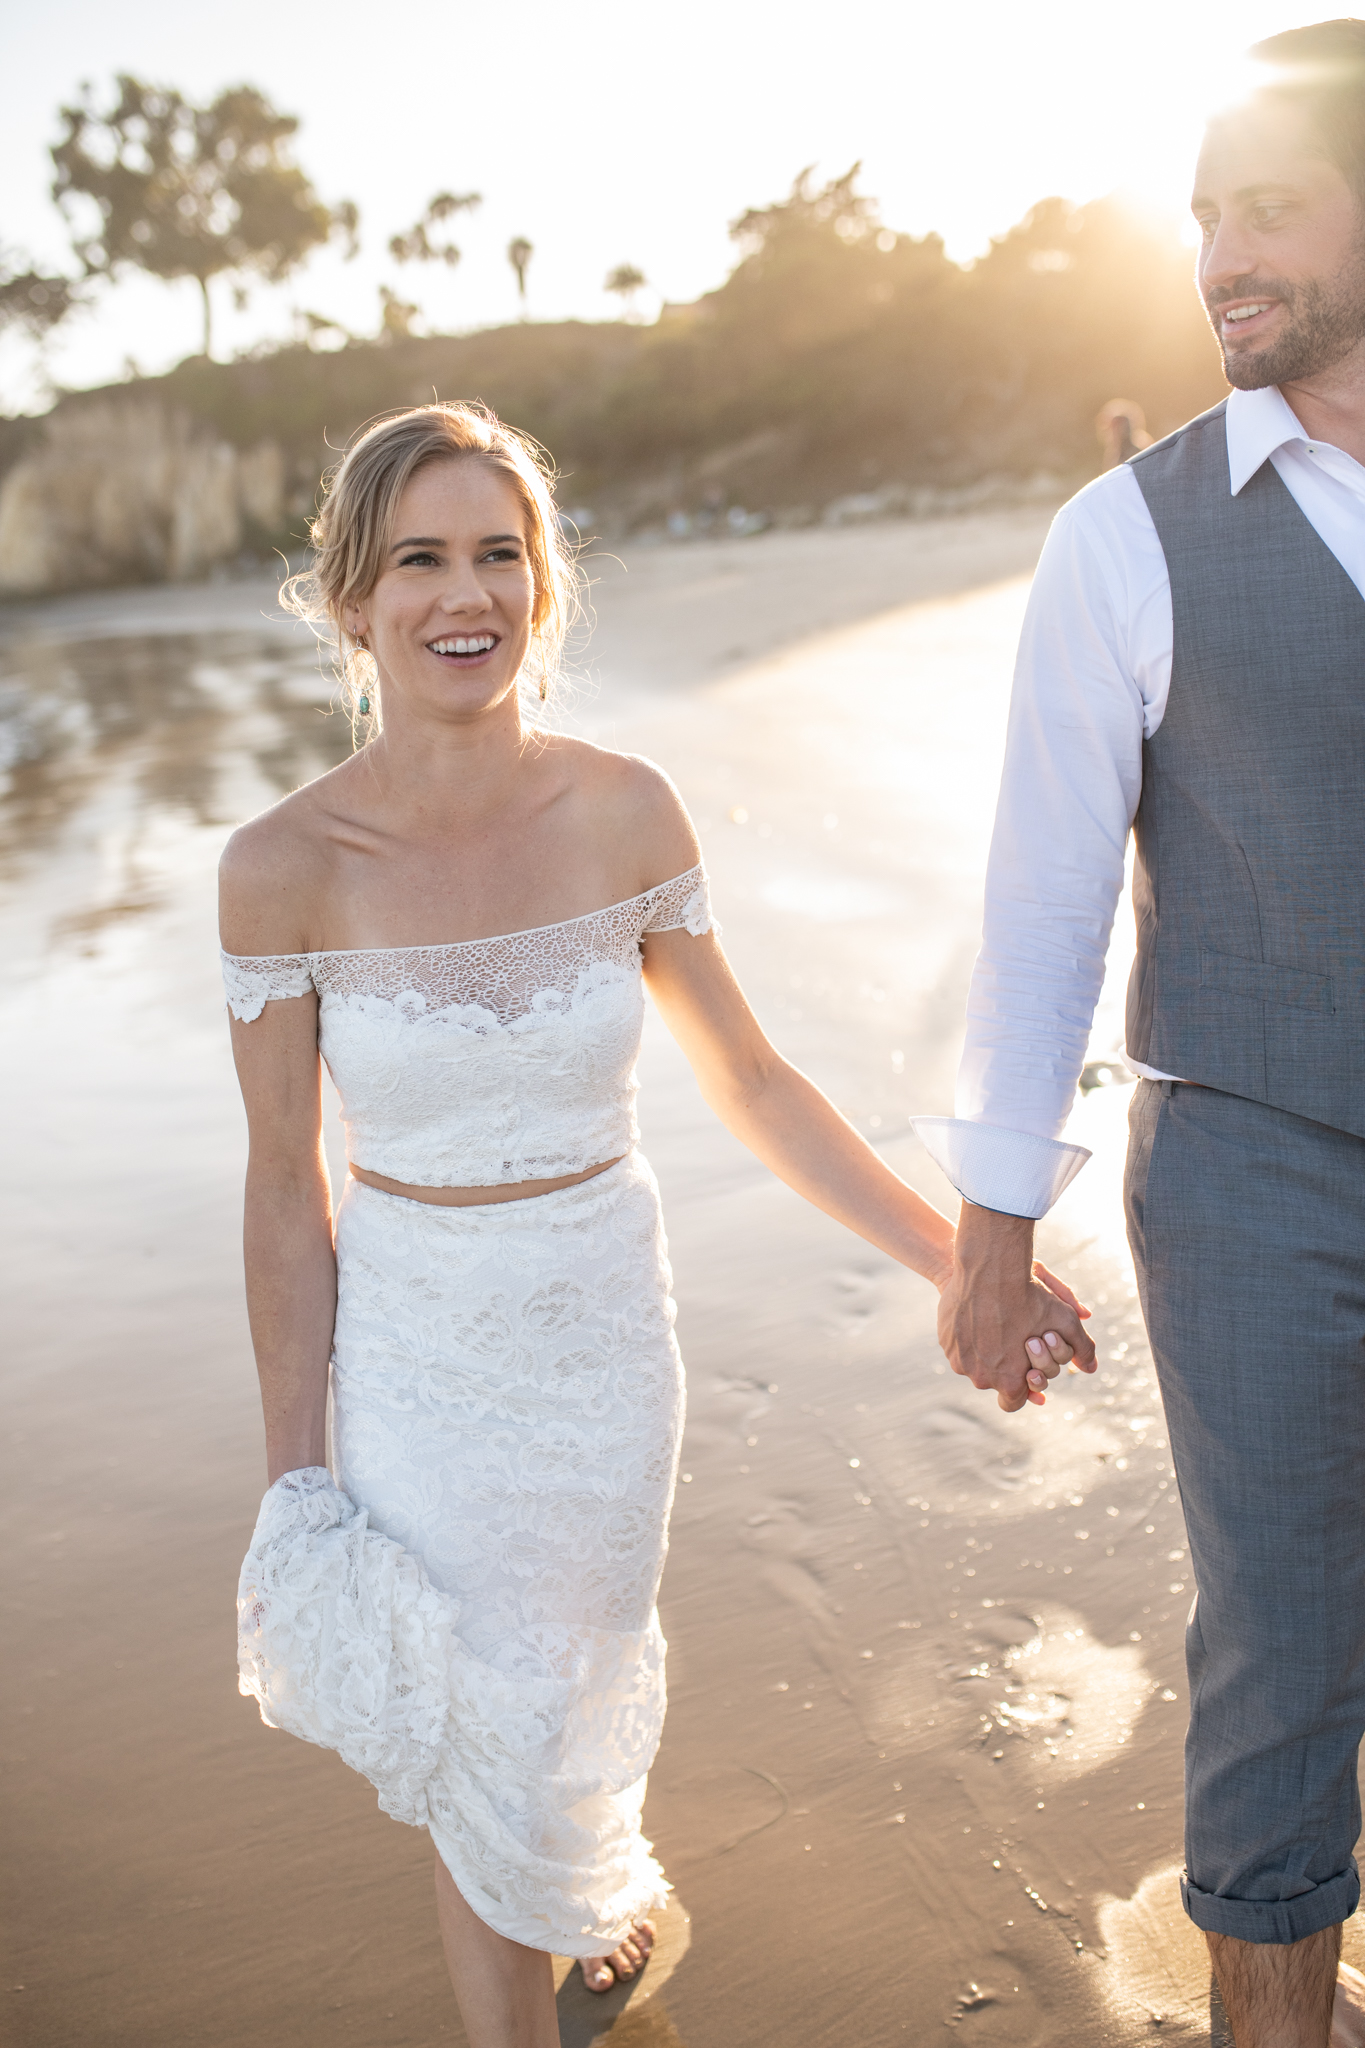 81_PRVW_Jenny_Ken_Wedding_Trevor_Hooper_Photo.jpg